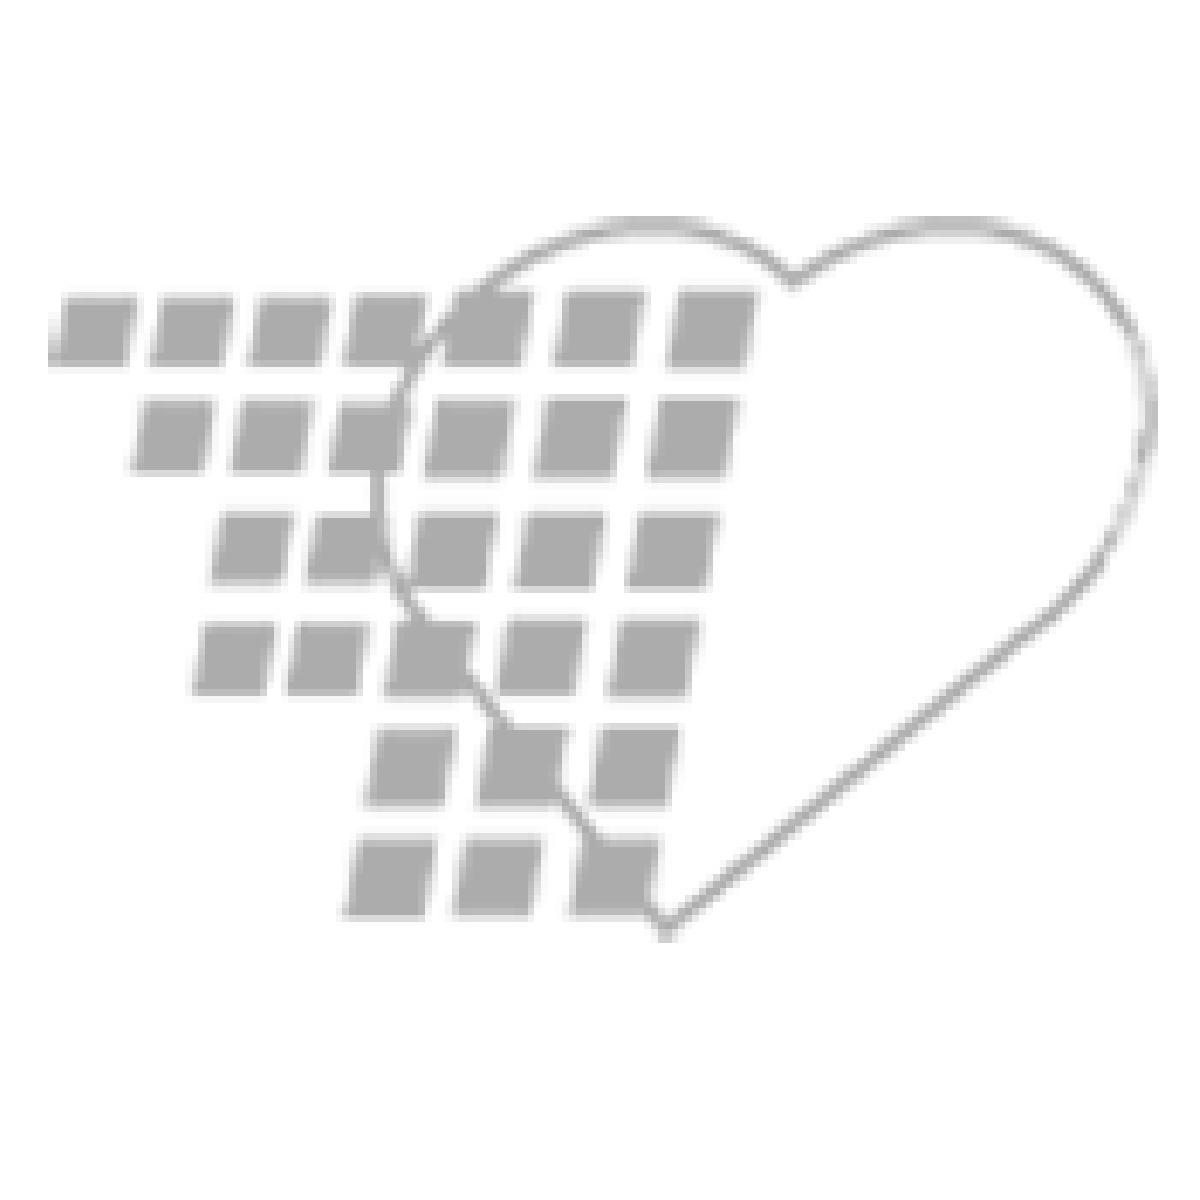 06-93-8001 - Demo Dose® Cyclophosphamid  Cytoxn 1g 50mL  50mL